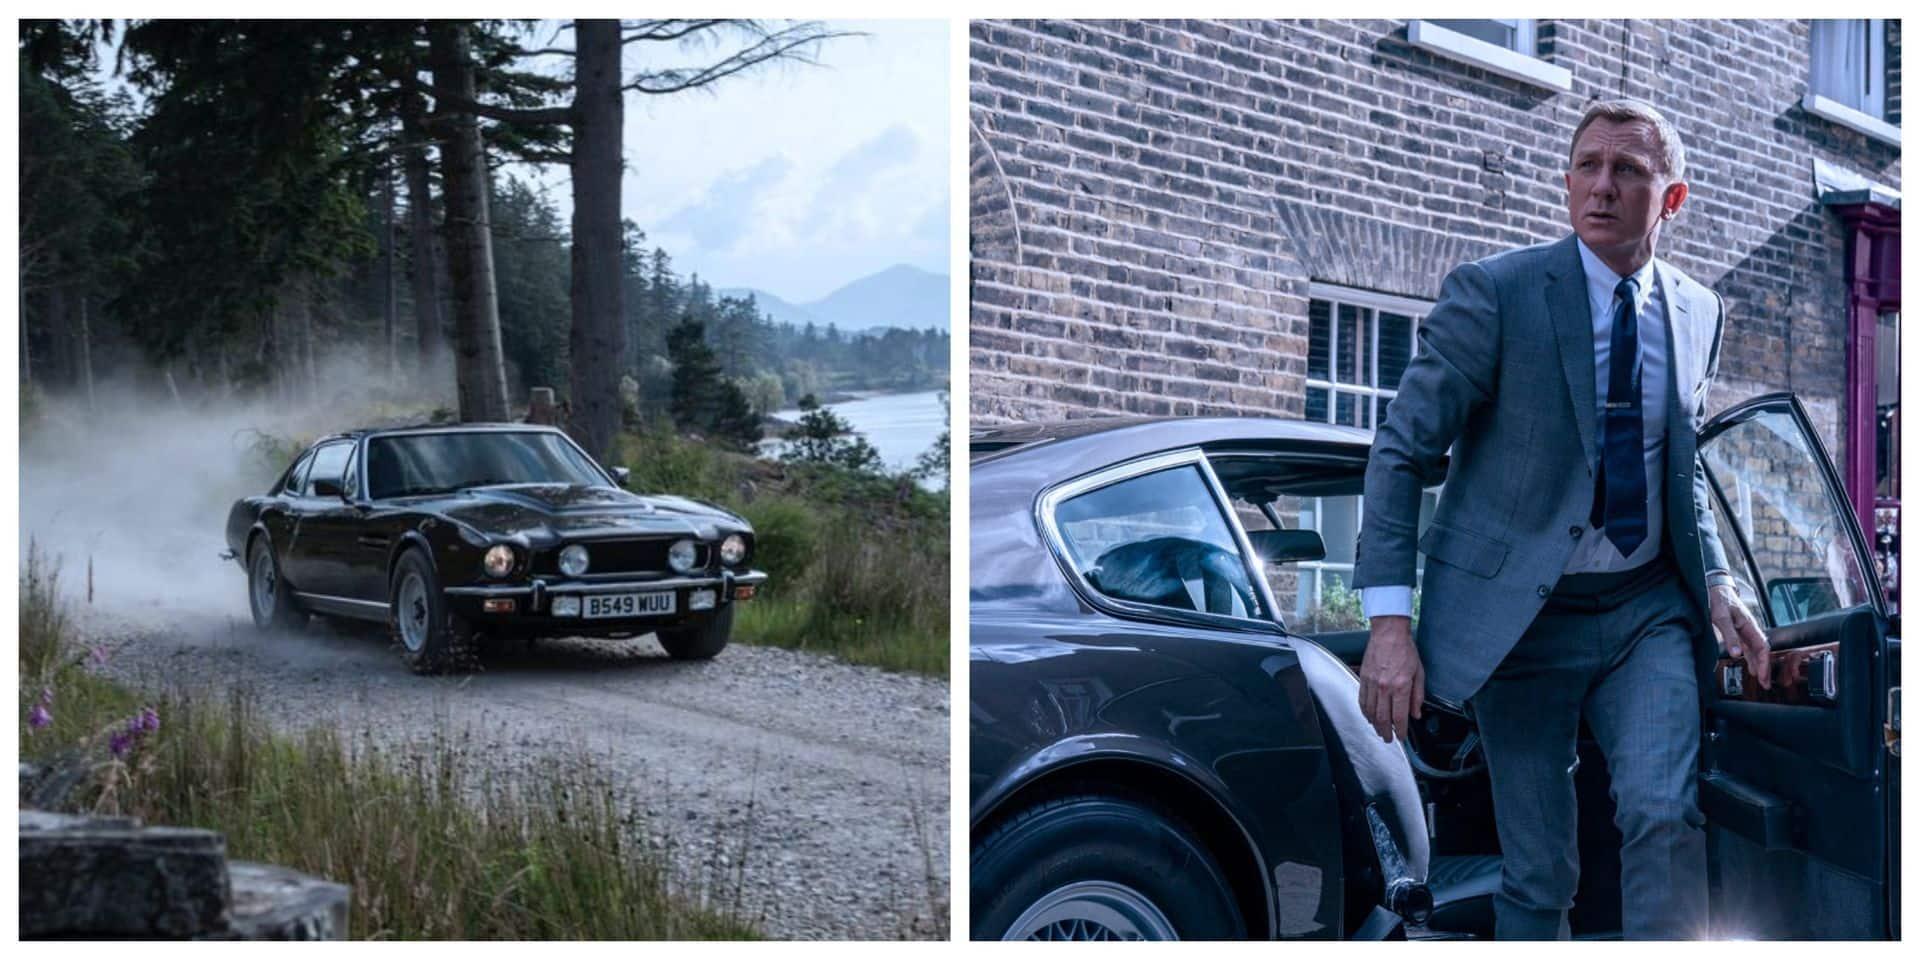 James Bond retrouve sa vieille Aston Martin V8 Vantage de 1987 dans No Time To Die